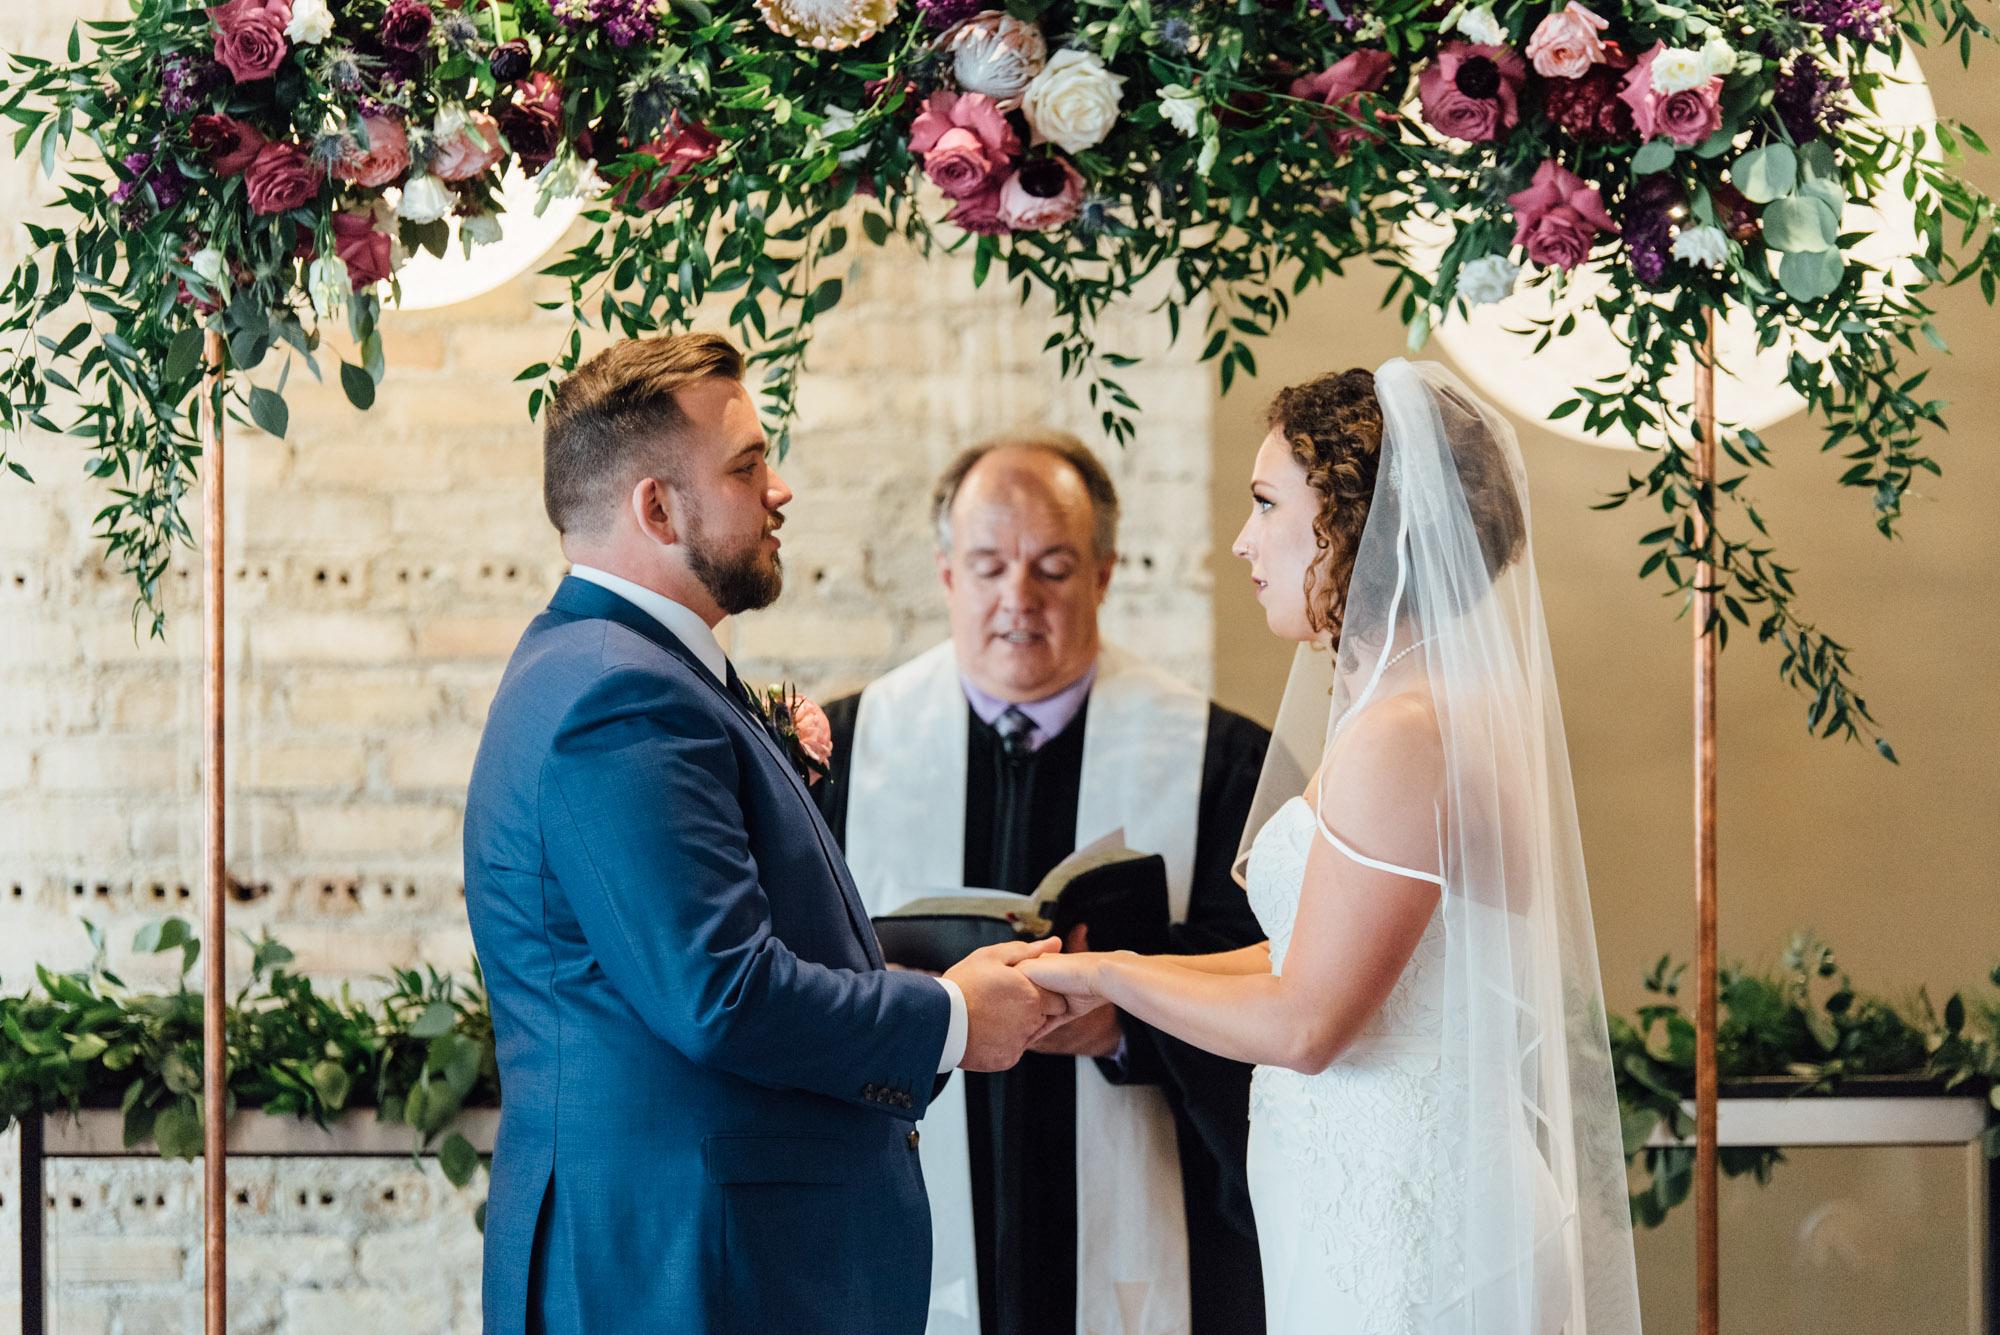 five-event-center-wedding-photographe-14.jpg